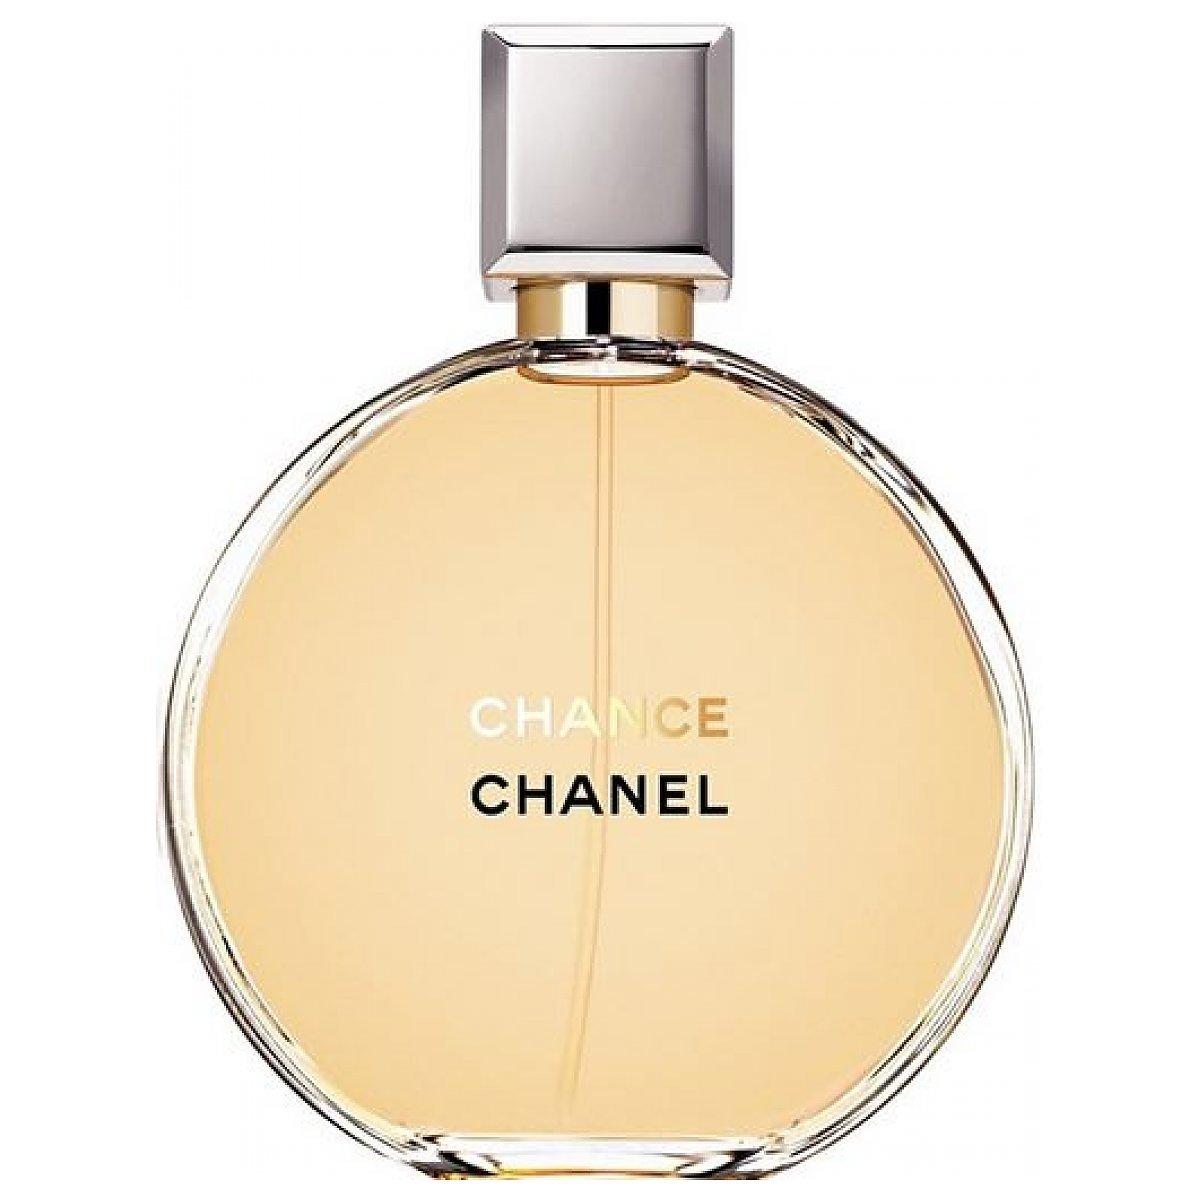 2b29dcd6a2e70 CHANEL Chance tester Woda perfumowana spray 100ml - Testery-perfum.pl